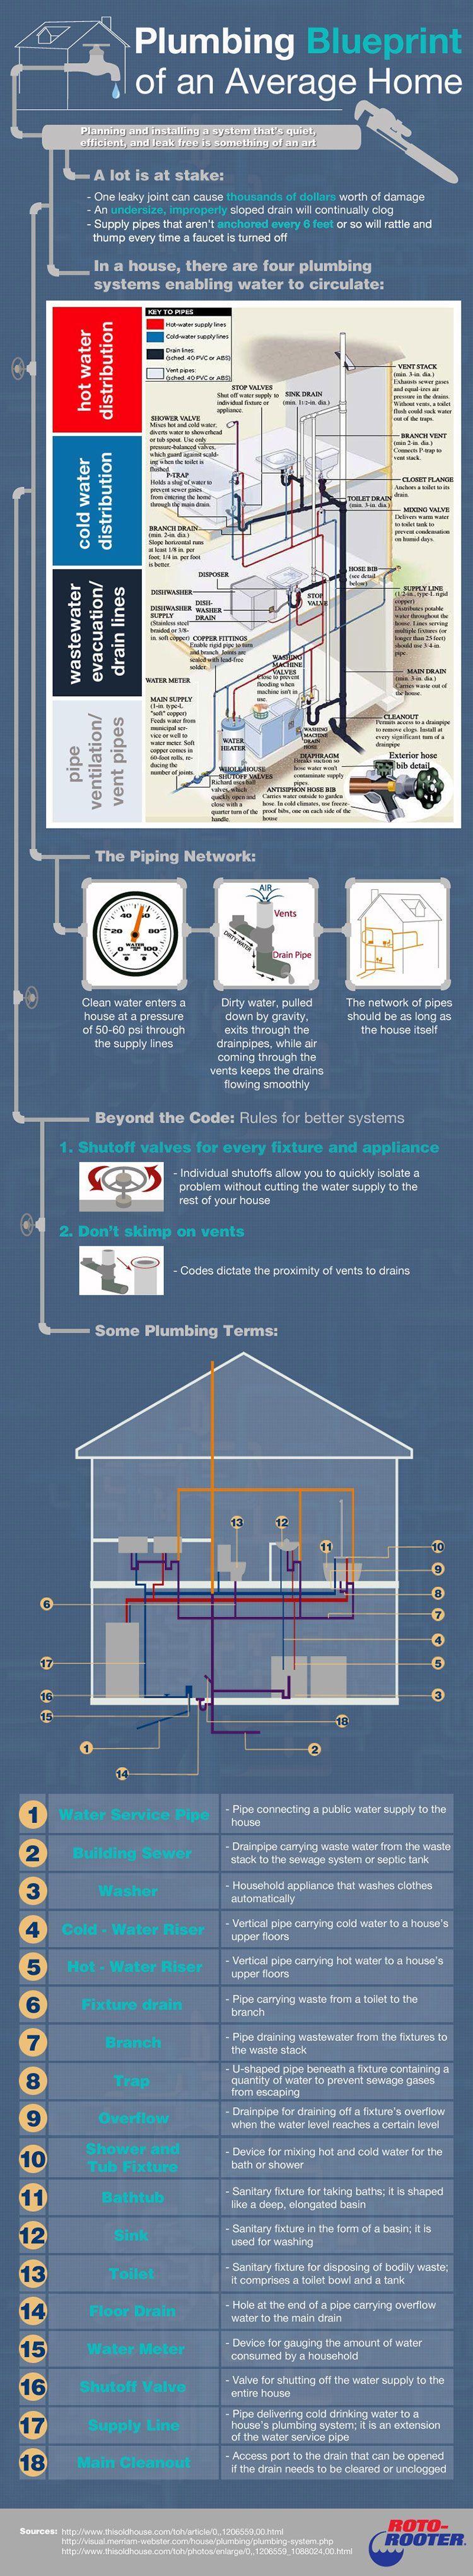 Steps On How To Do Toilet Plumbing Right Plumbing Diy Plumbing Plumbing Repair